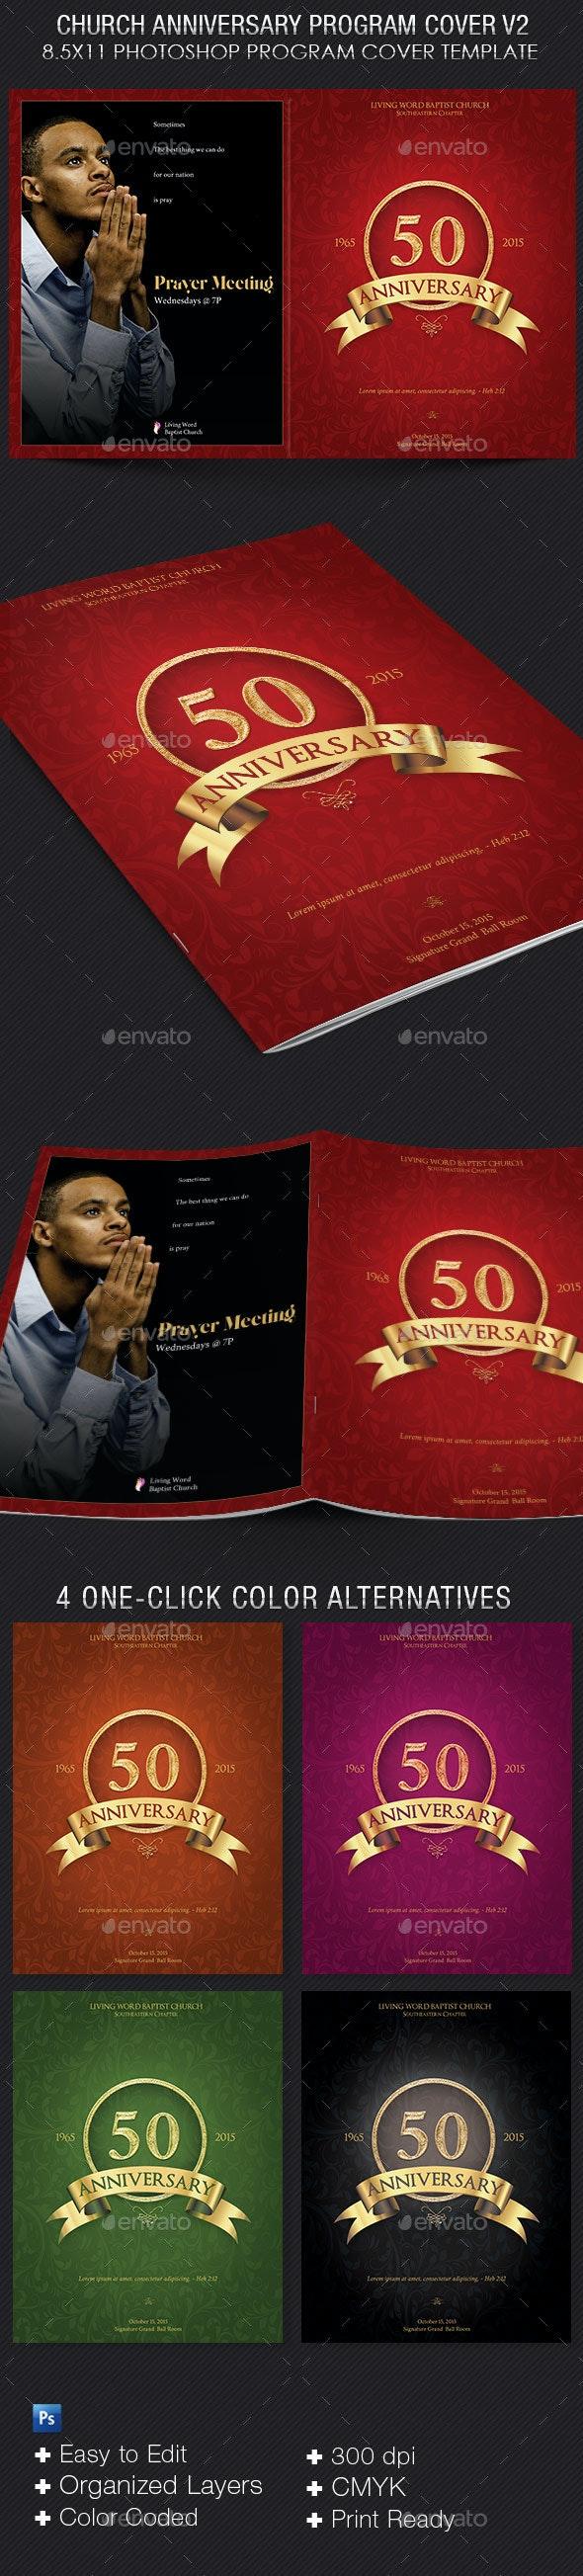 Church Anniversary Program Cover Template V2 - Magazines Print Templates